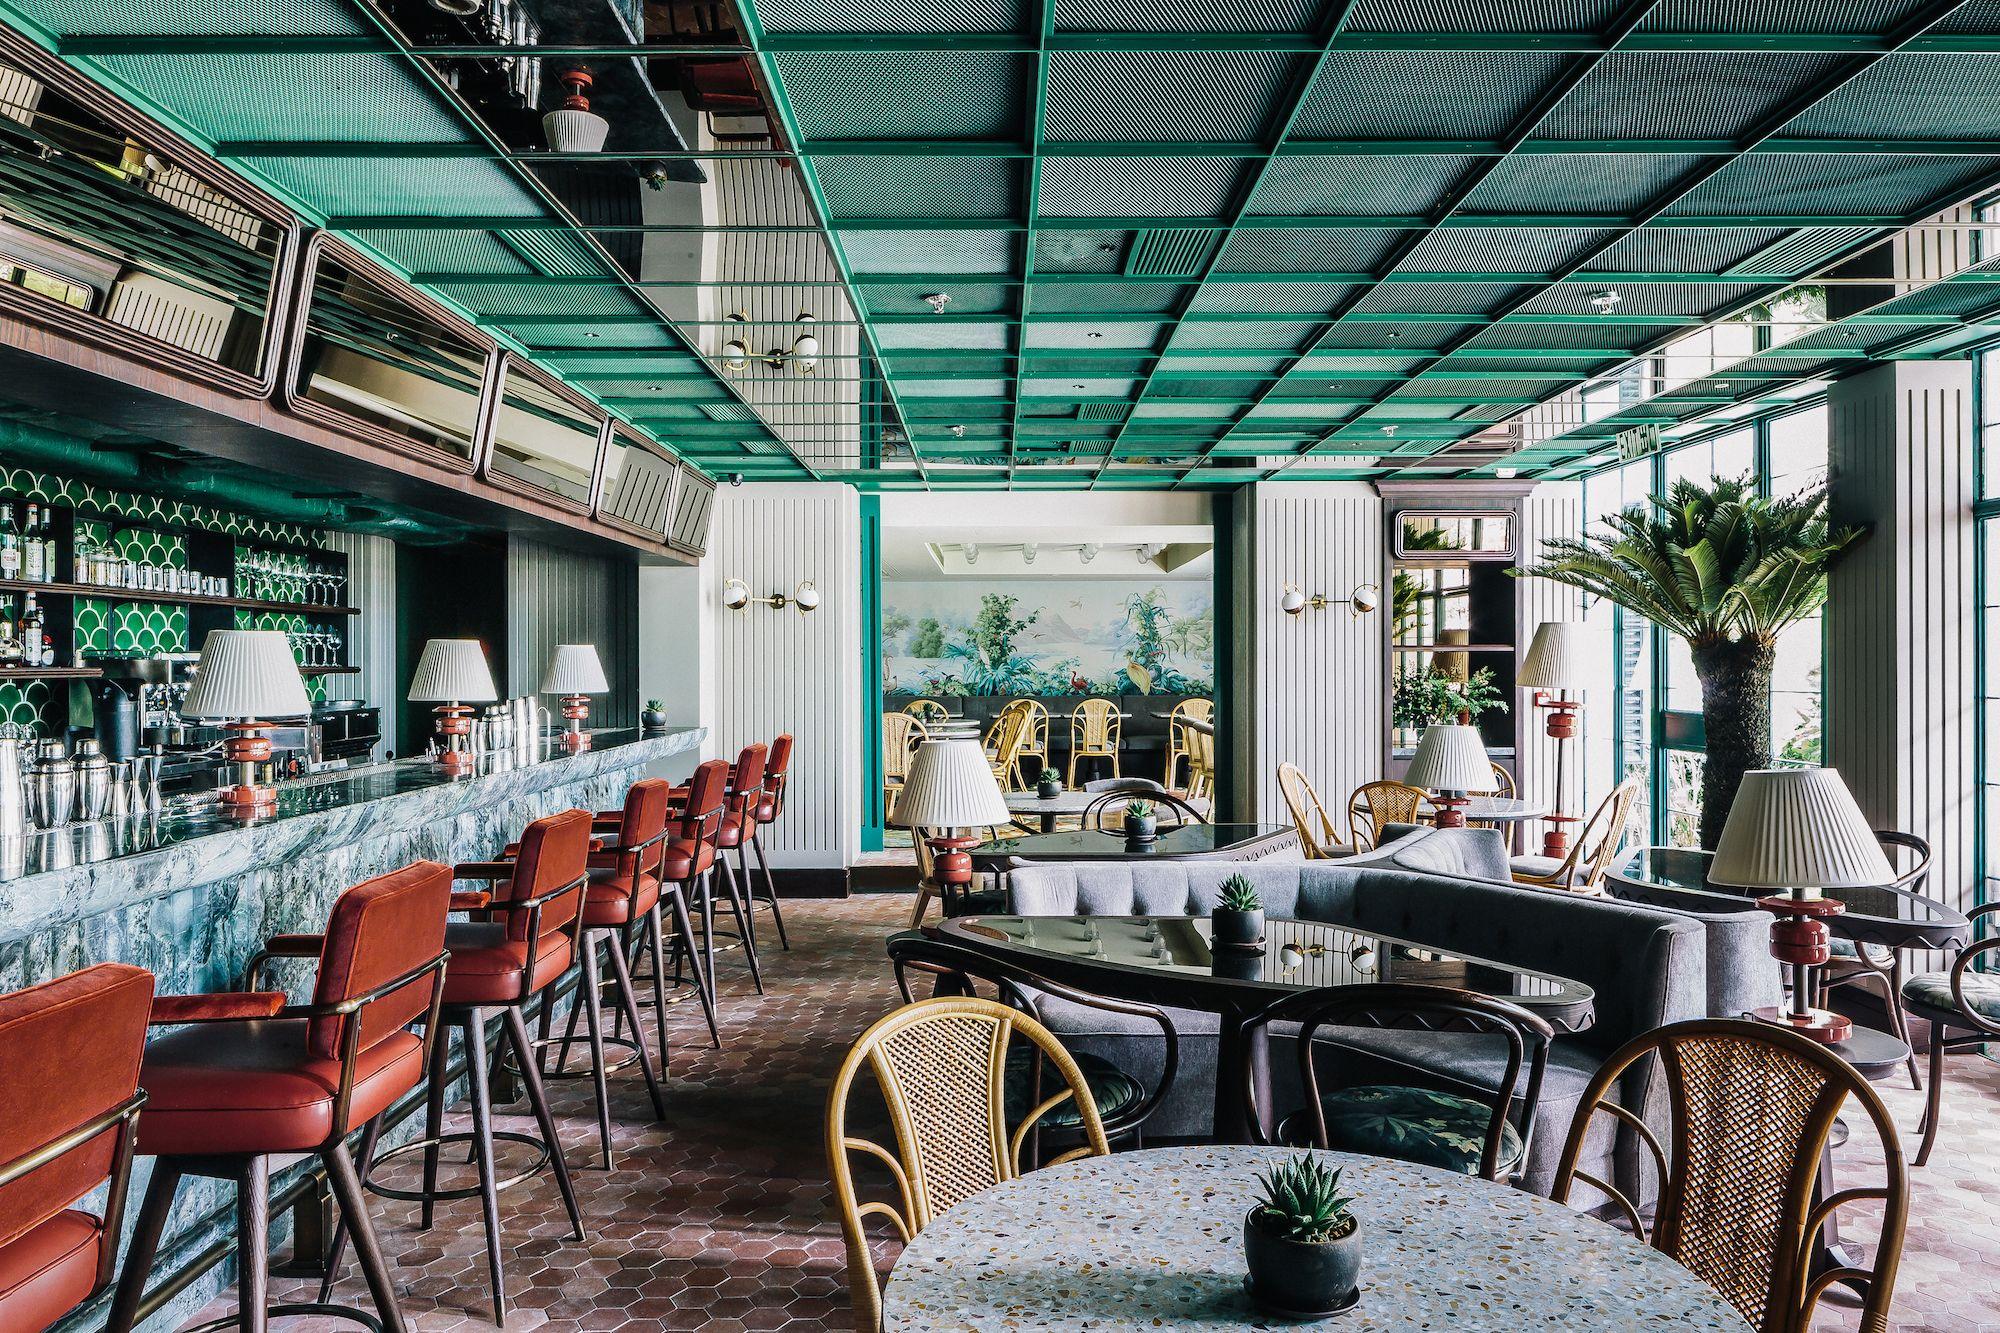 Neighbourhood Guide: Where To Eat And Drink In Soho, Hong Kong